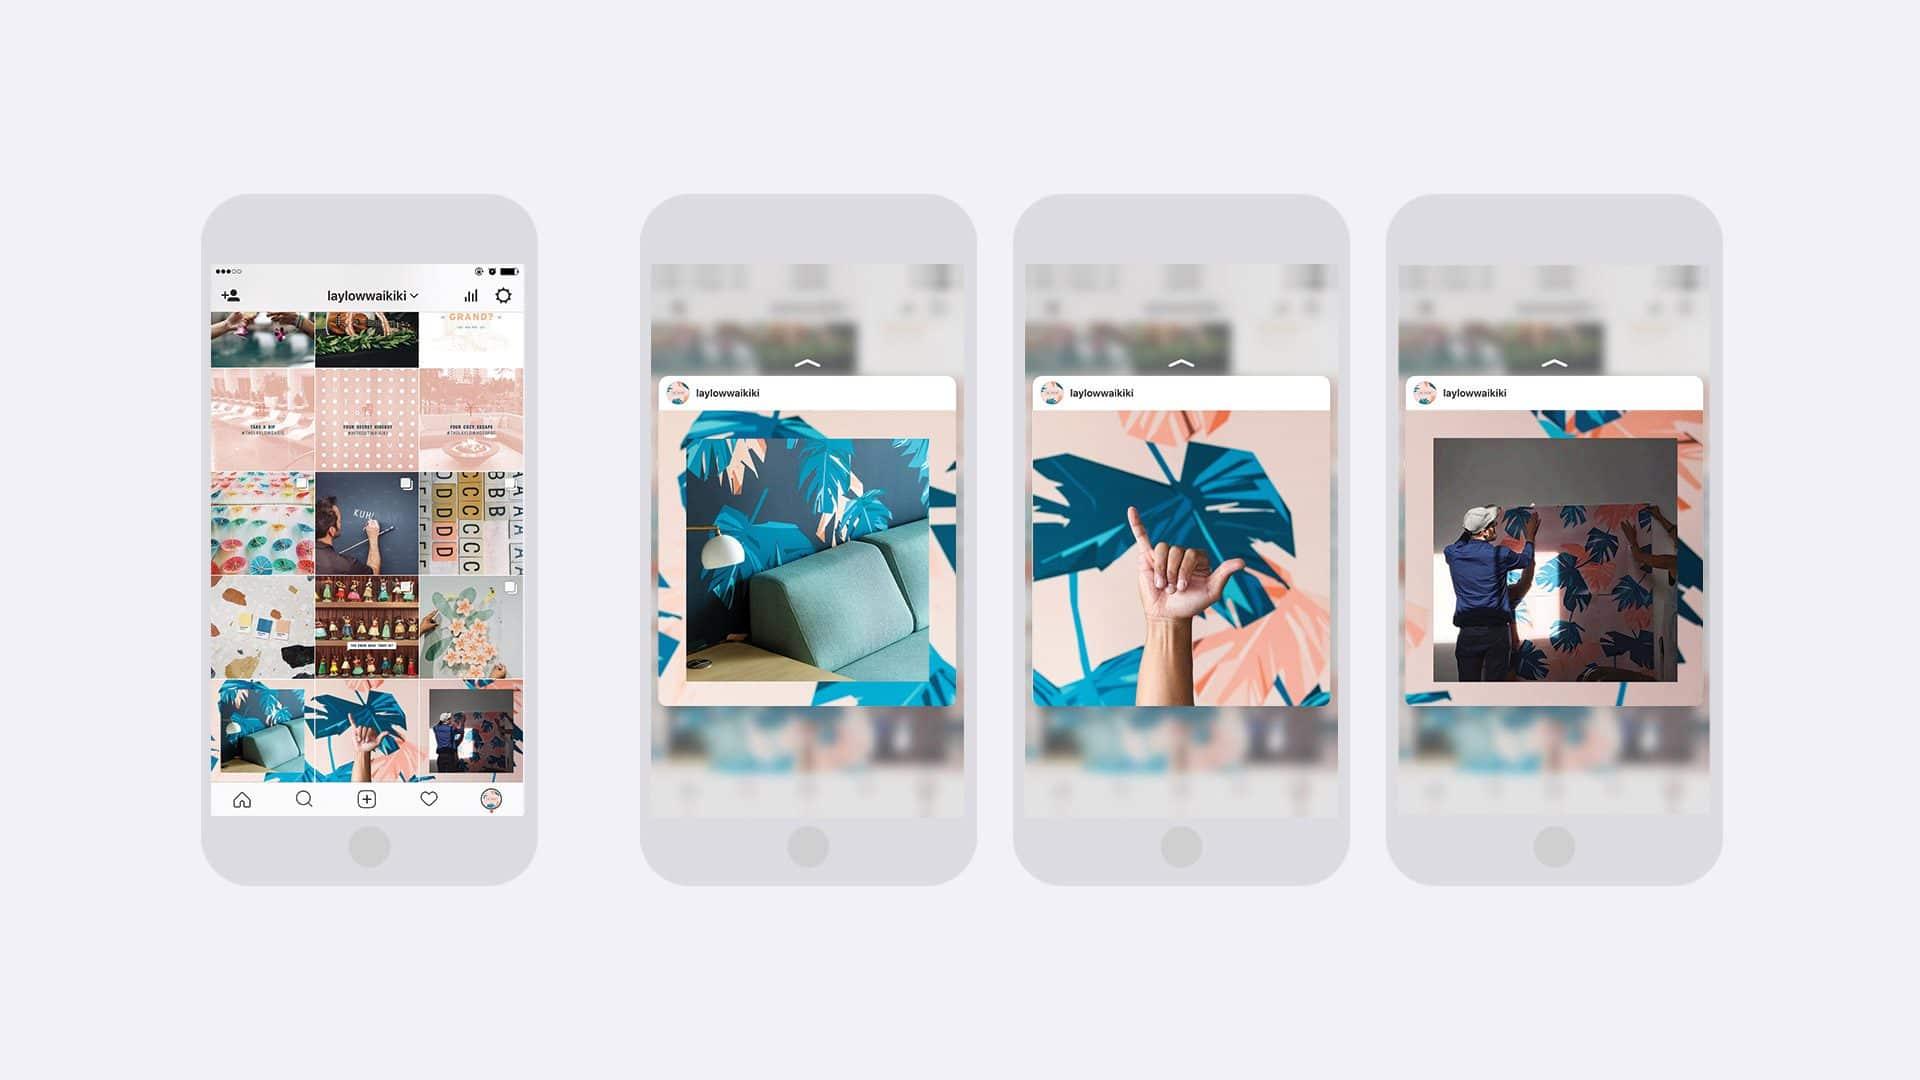 The LayLow Waikiki Social Media